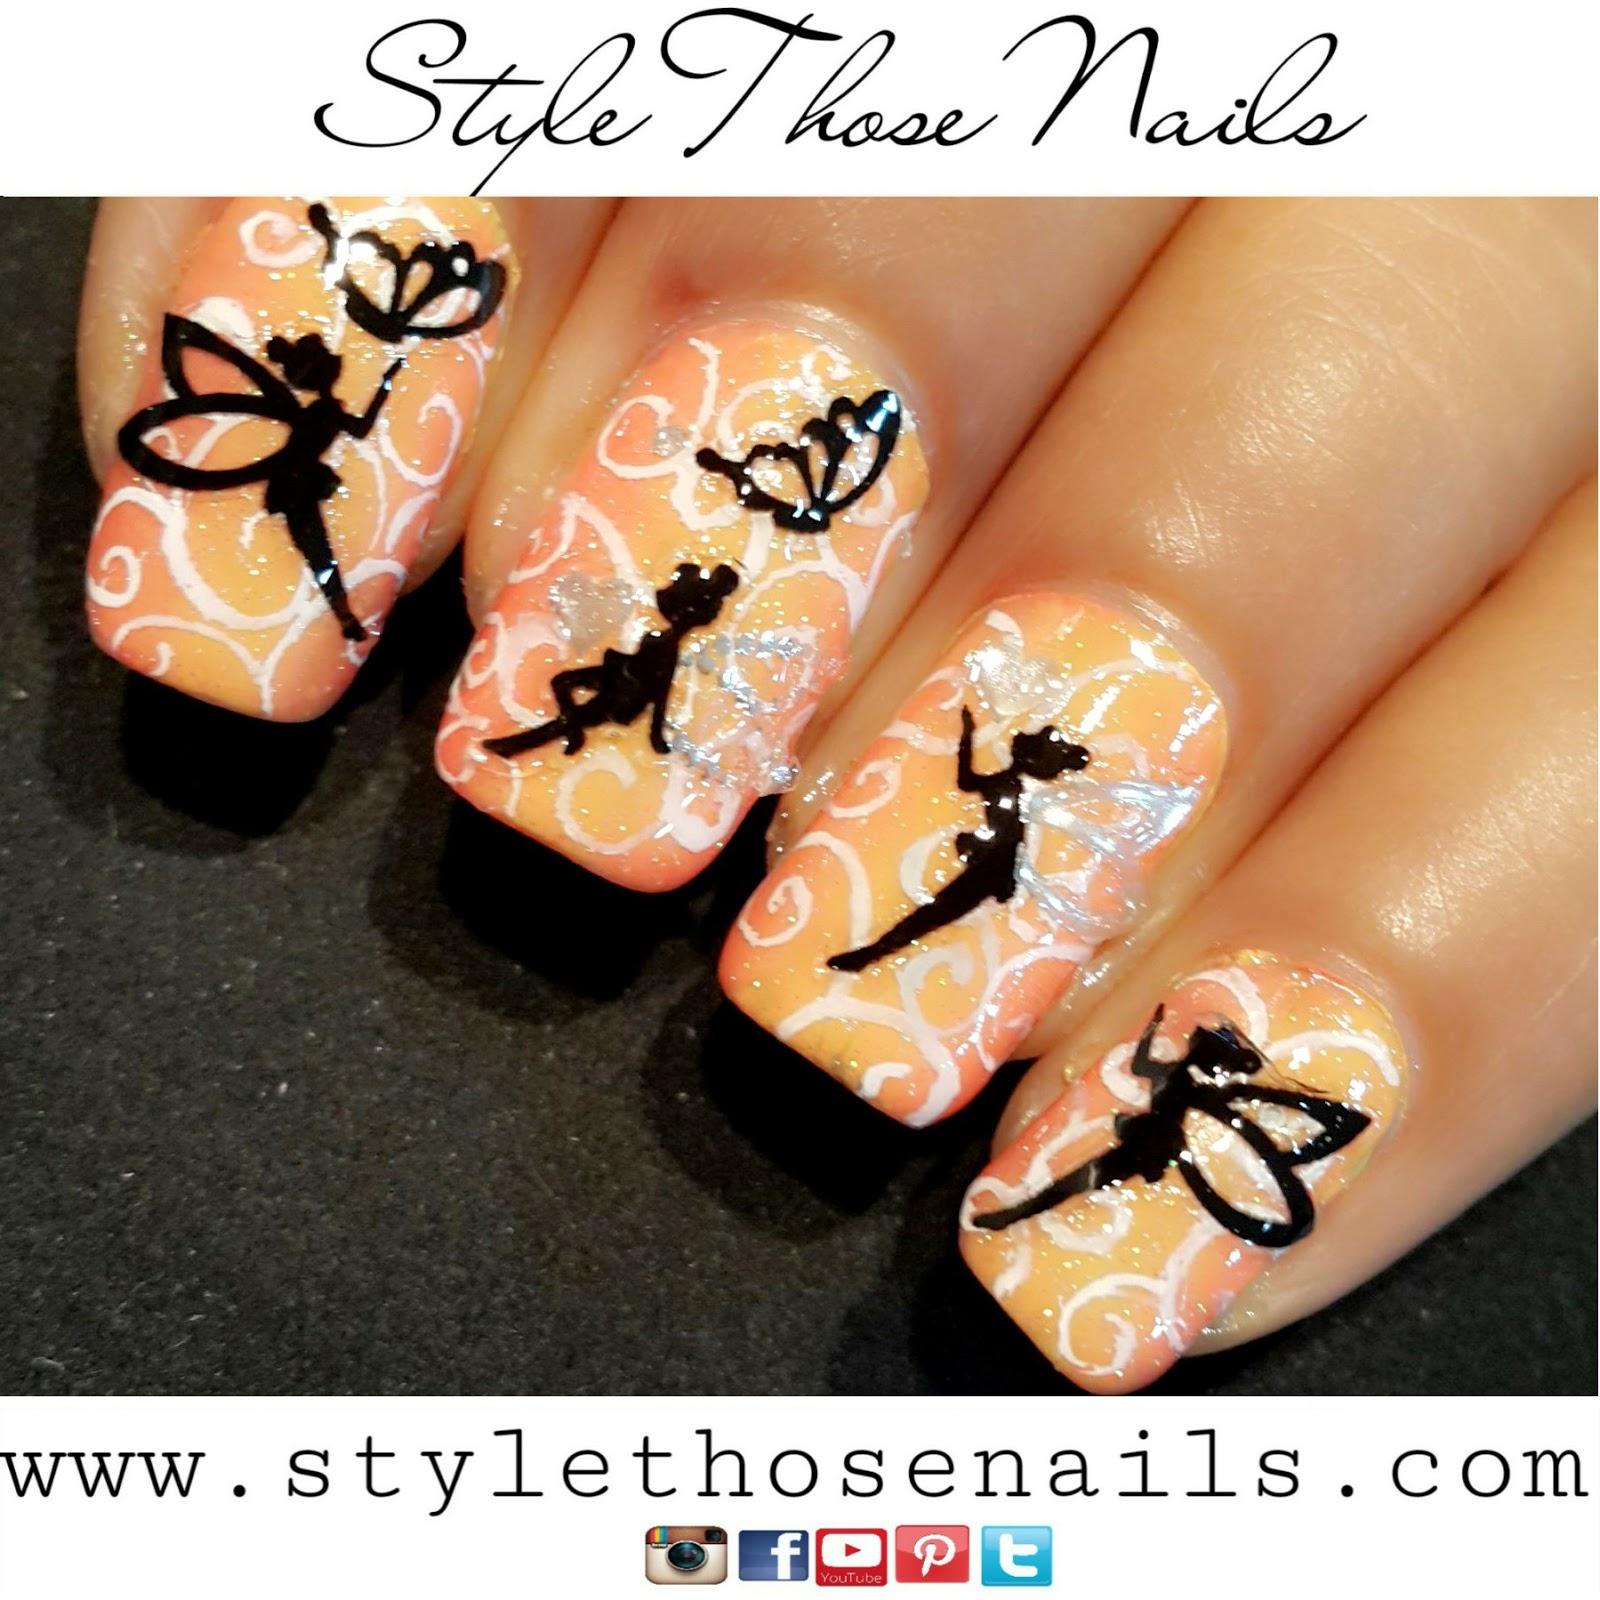 Fairy nail art gallery nail art and nail design ideas style those nails 40 great nail art ideas things that fly 40 great nail art ideas prinsesfo Images